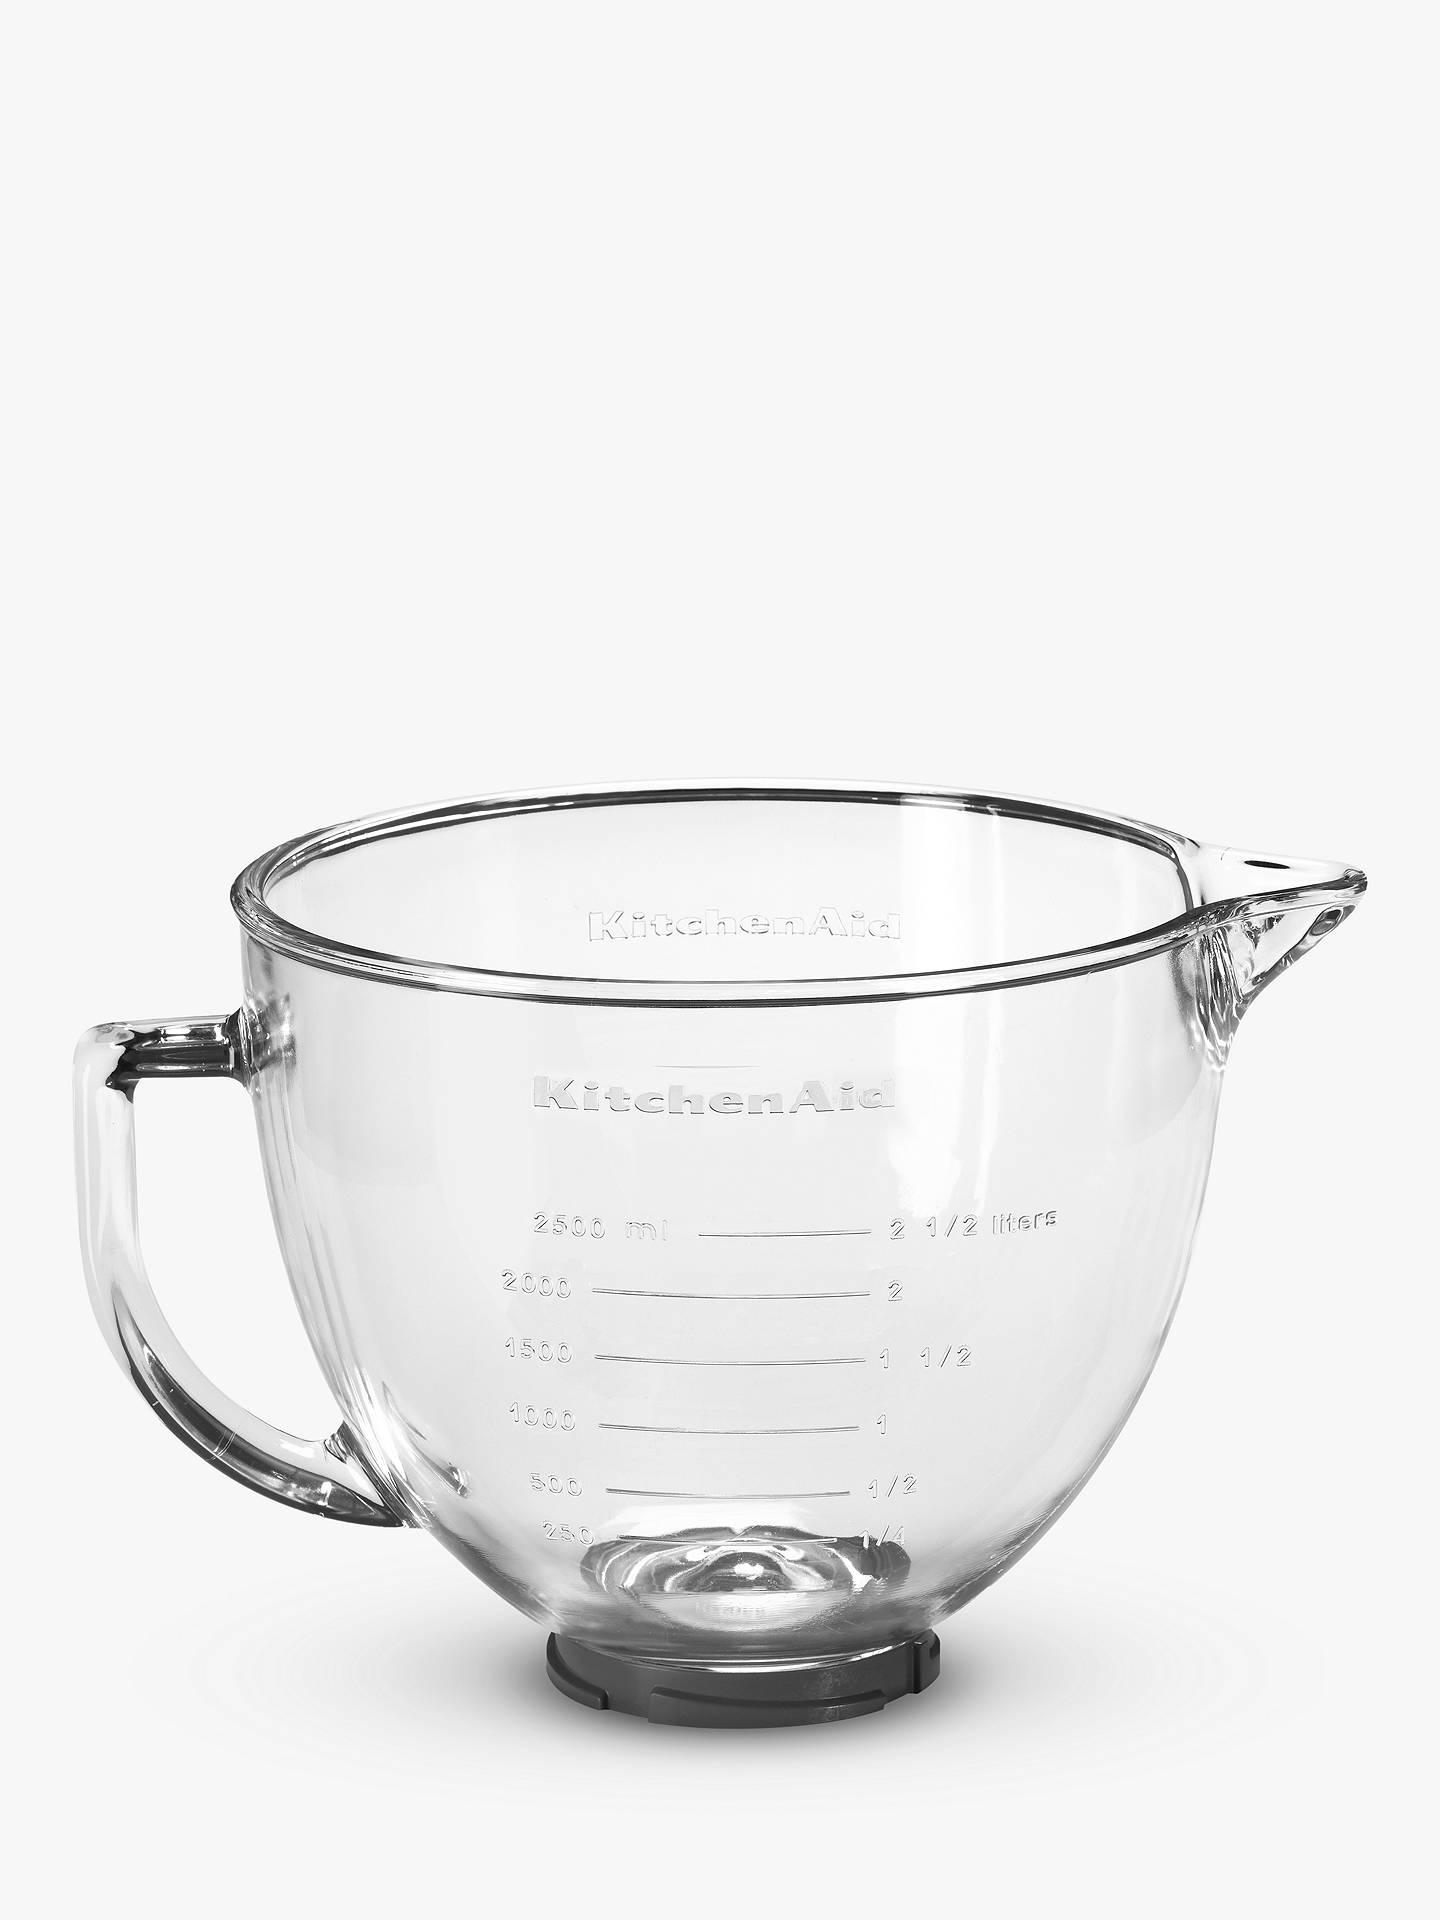 KitchenAid 4.83L Glass Bowl for Stand Mixer